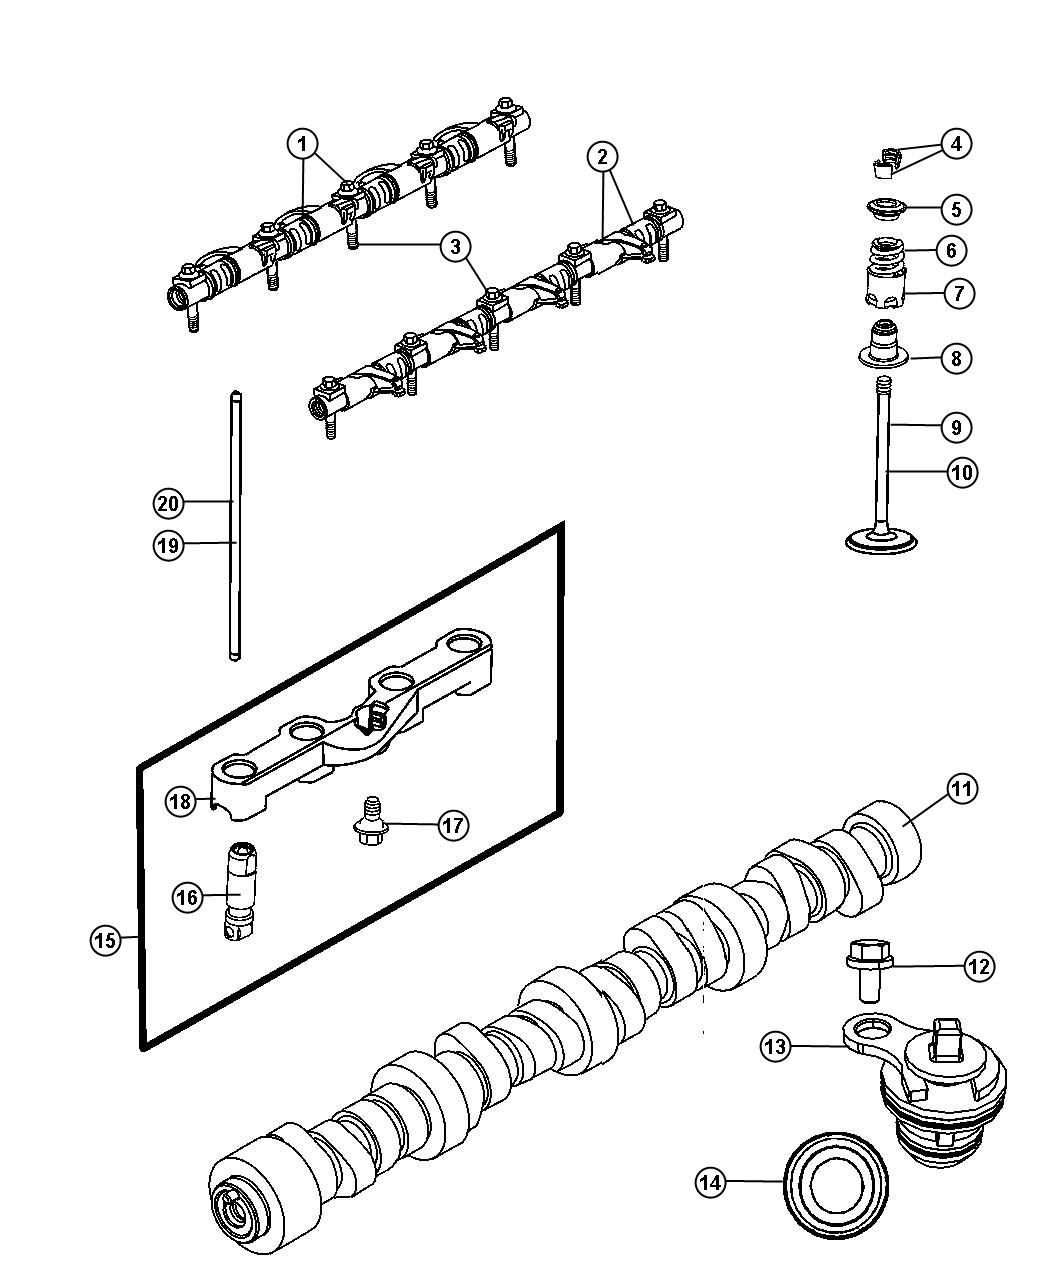 2008 Chrysler 300 Seal. Valve guide. Exhaust, intake